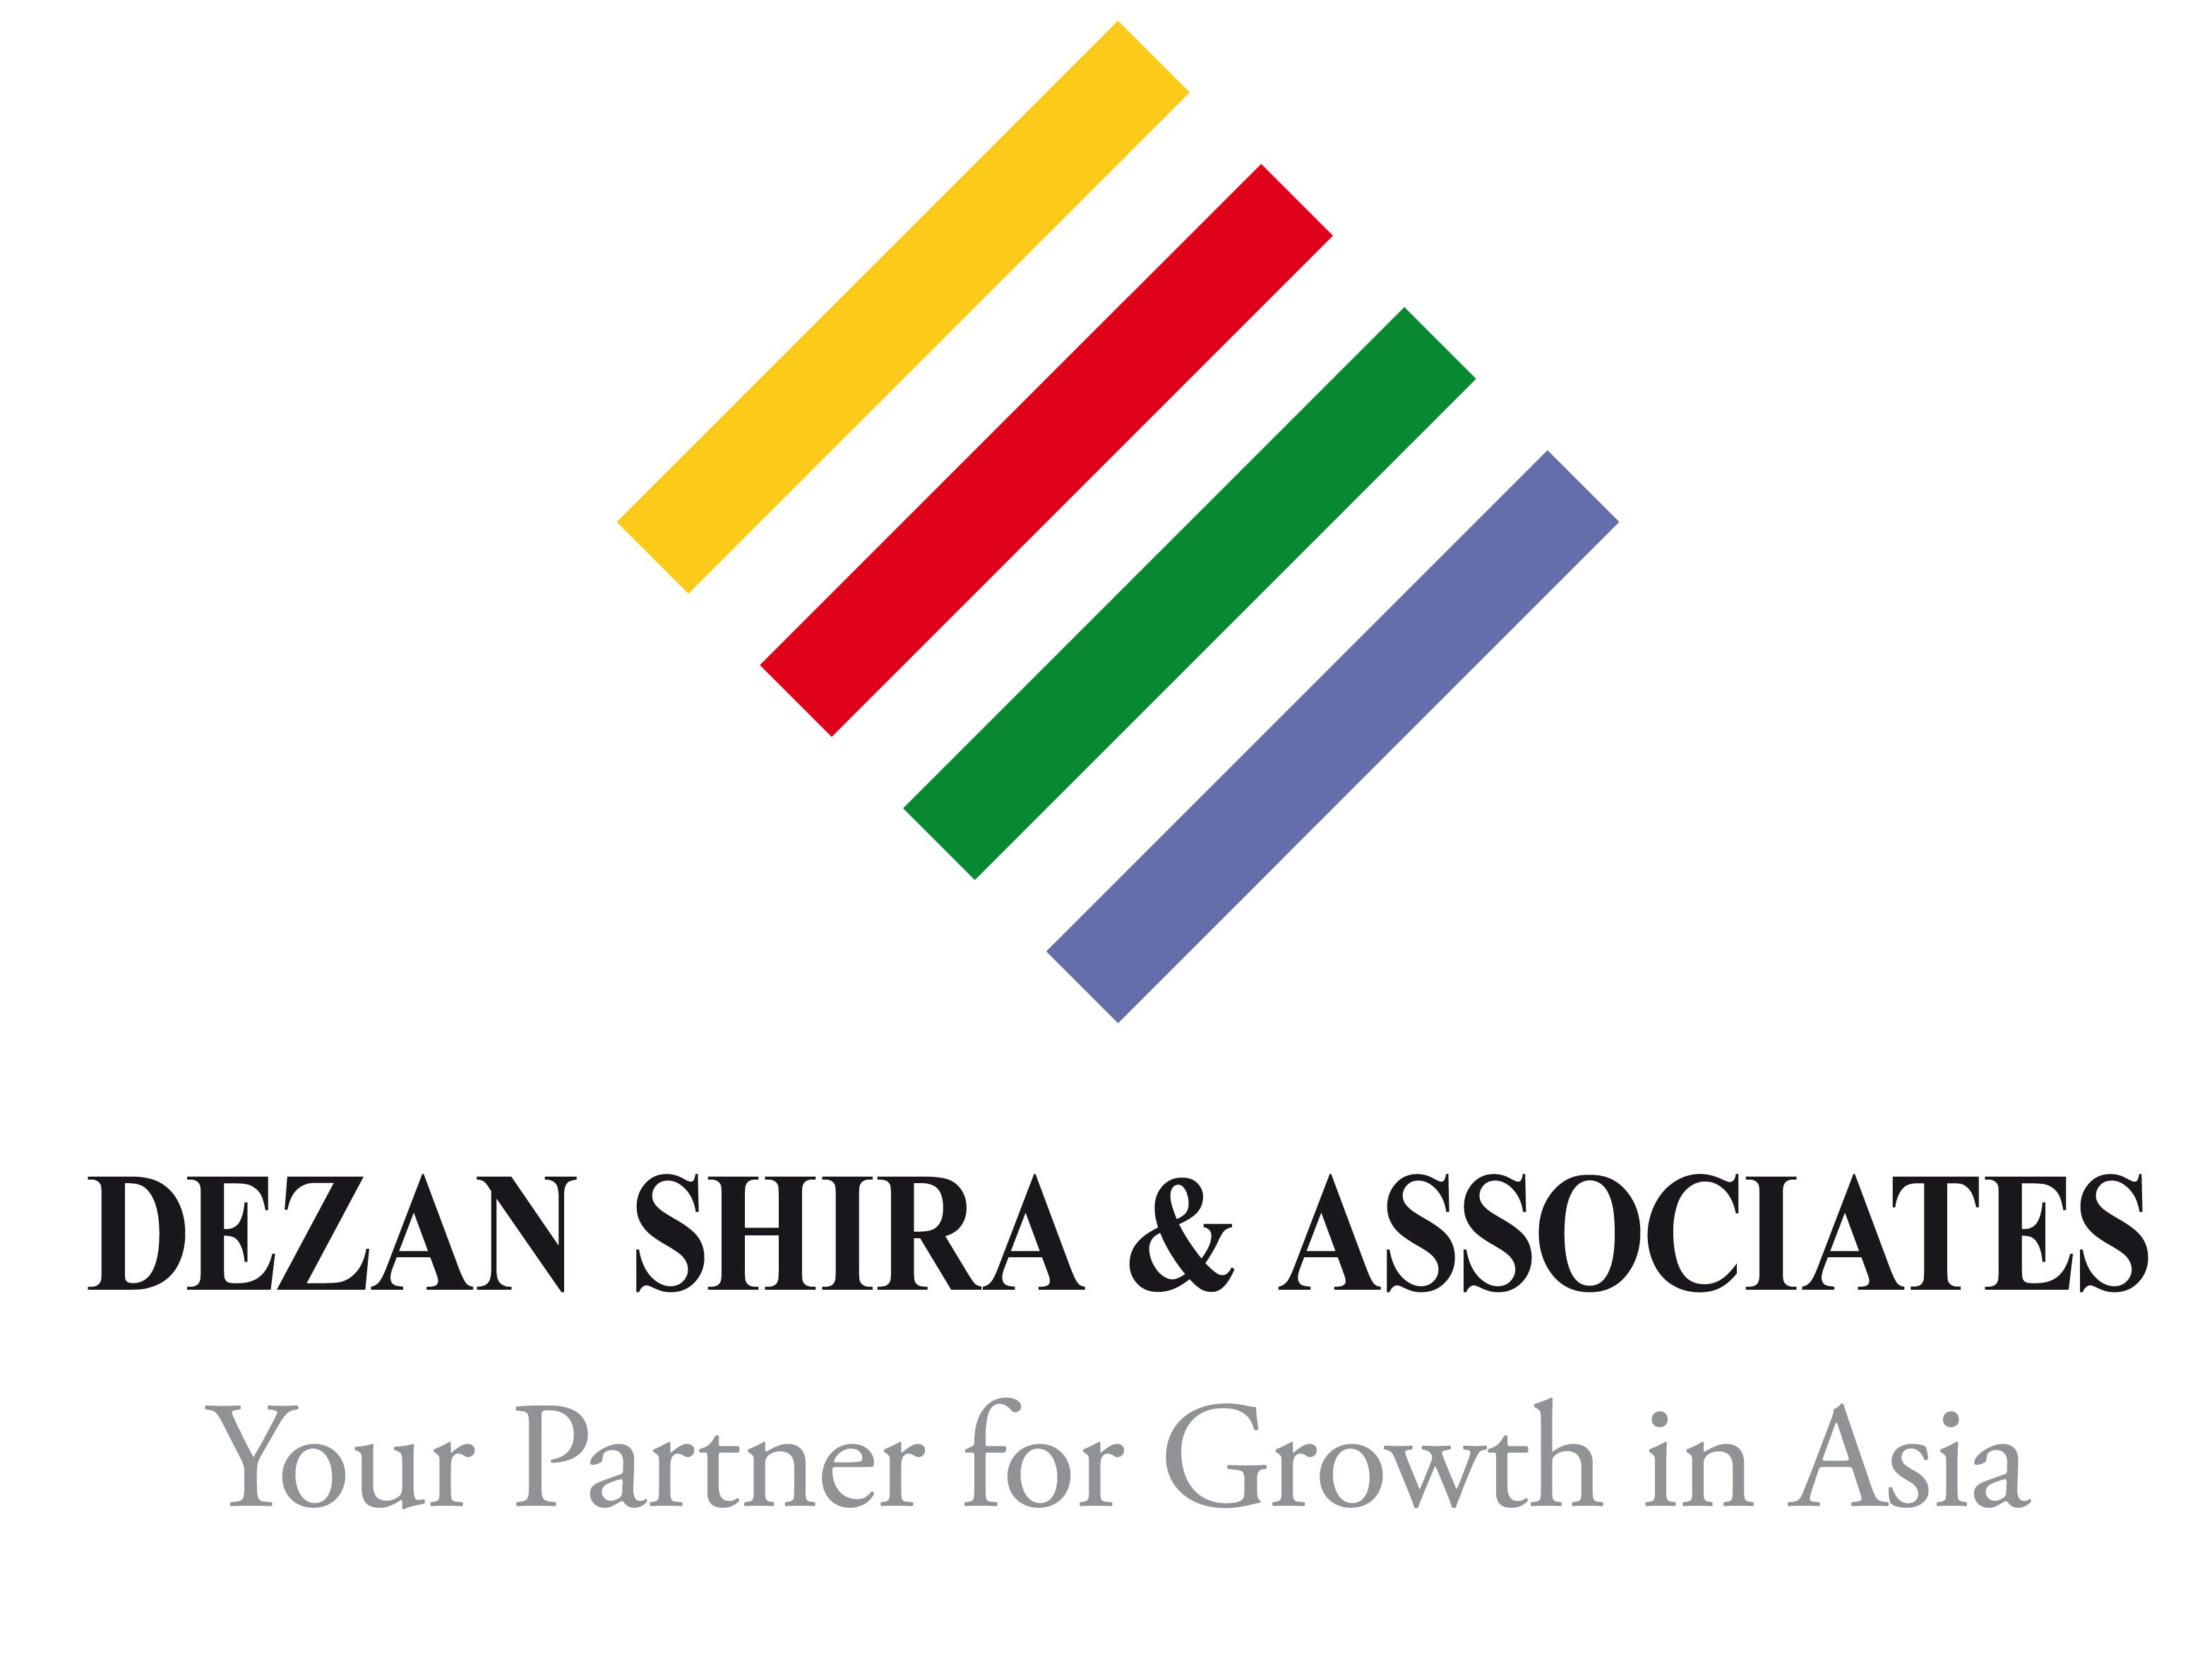 Dezan Shira&Associates